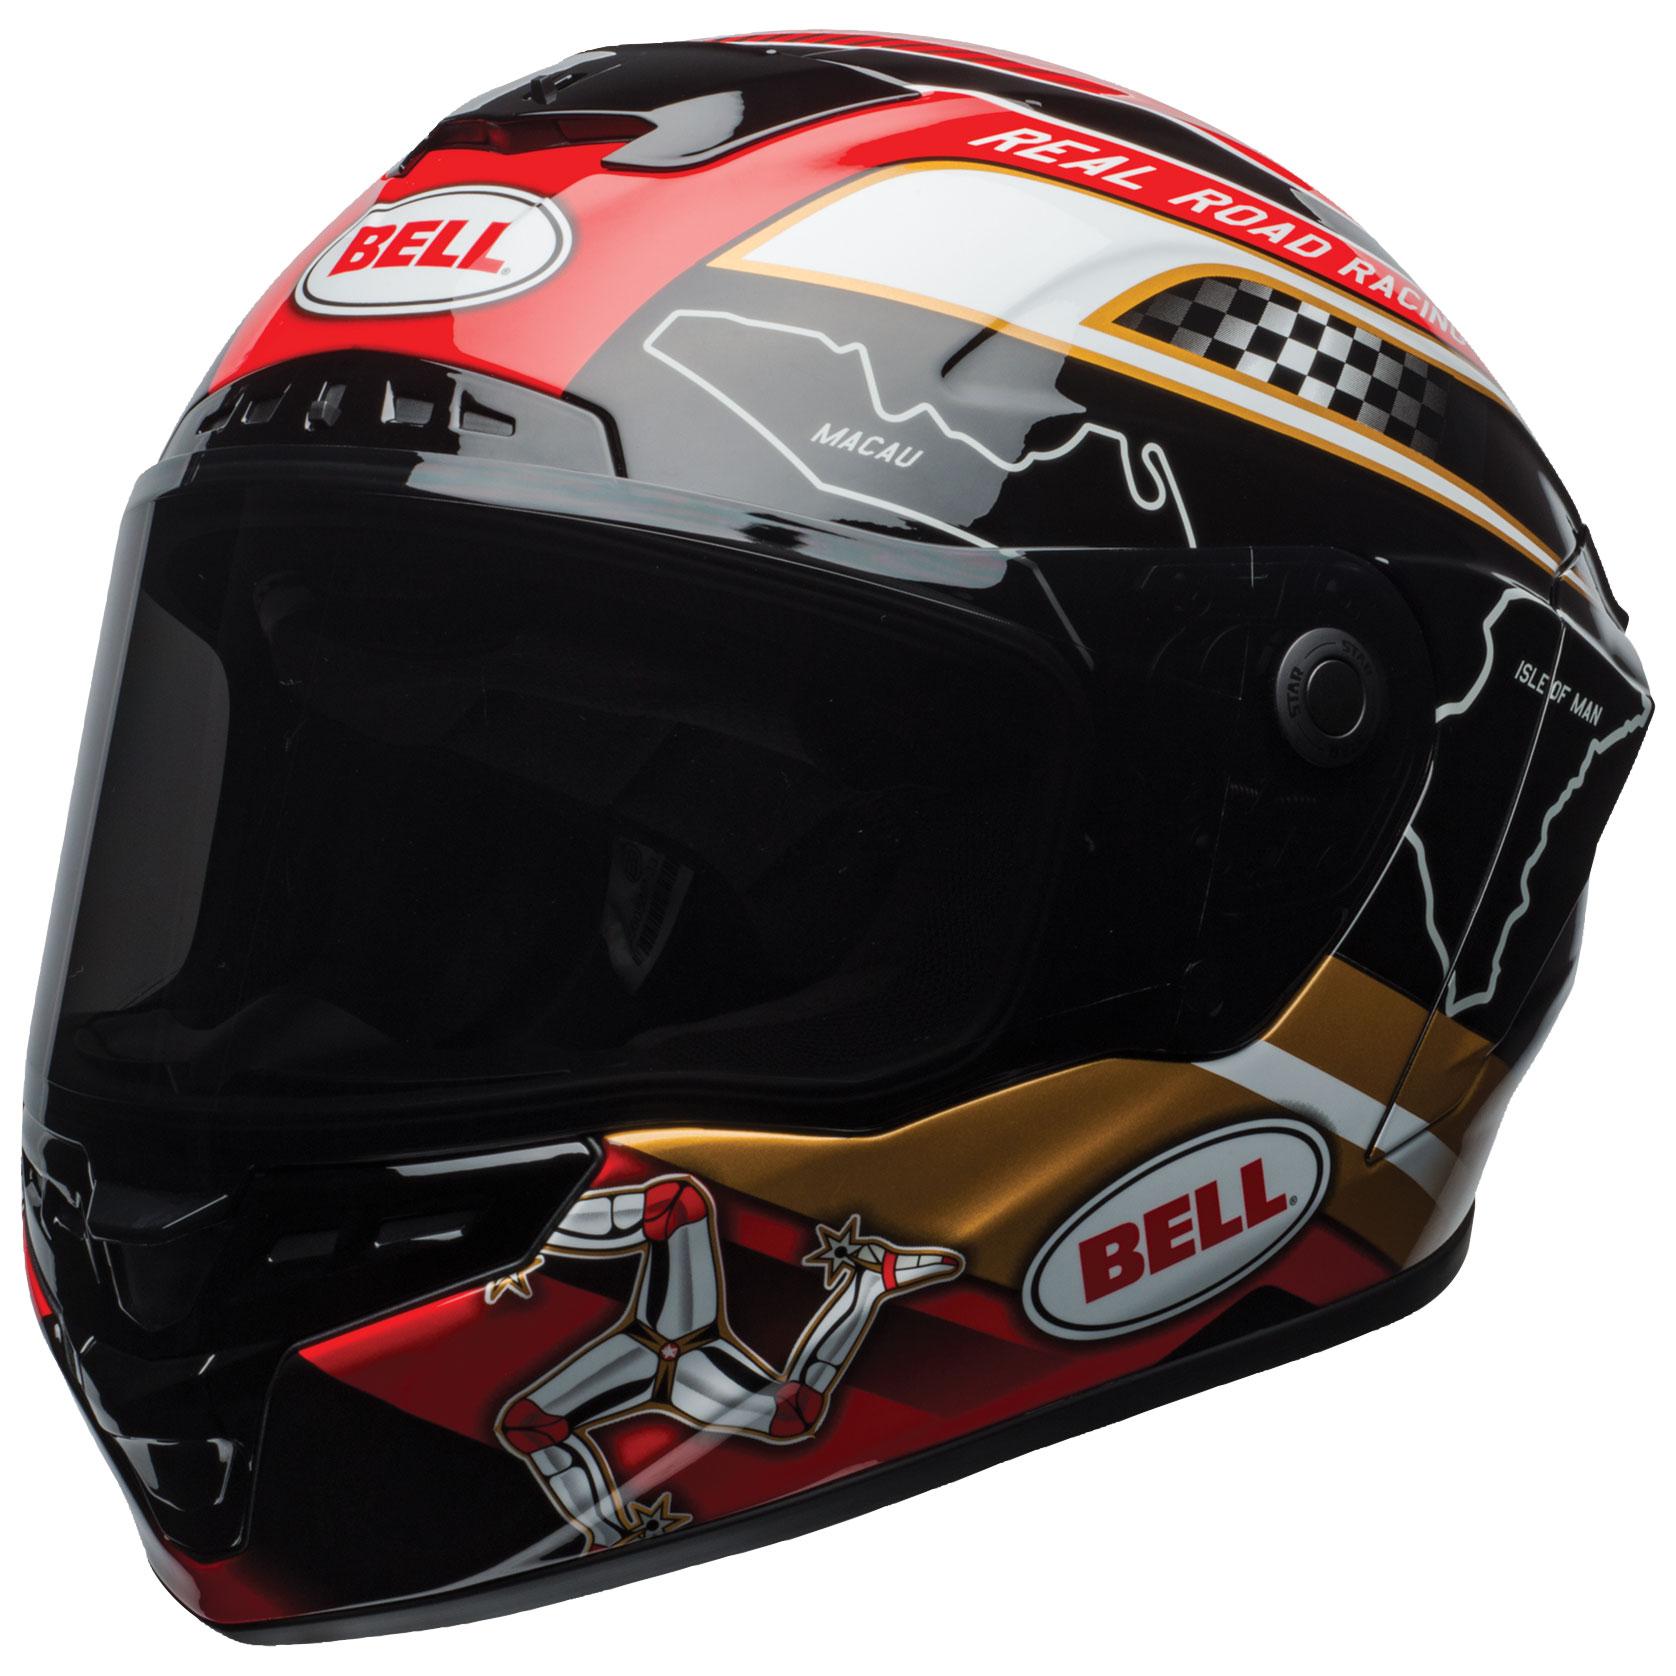 Bell Star MIPS DLX Isle of Man 2018 Full Face Helmet